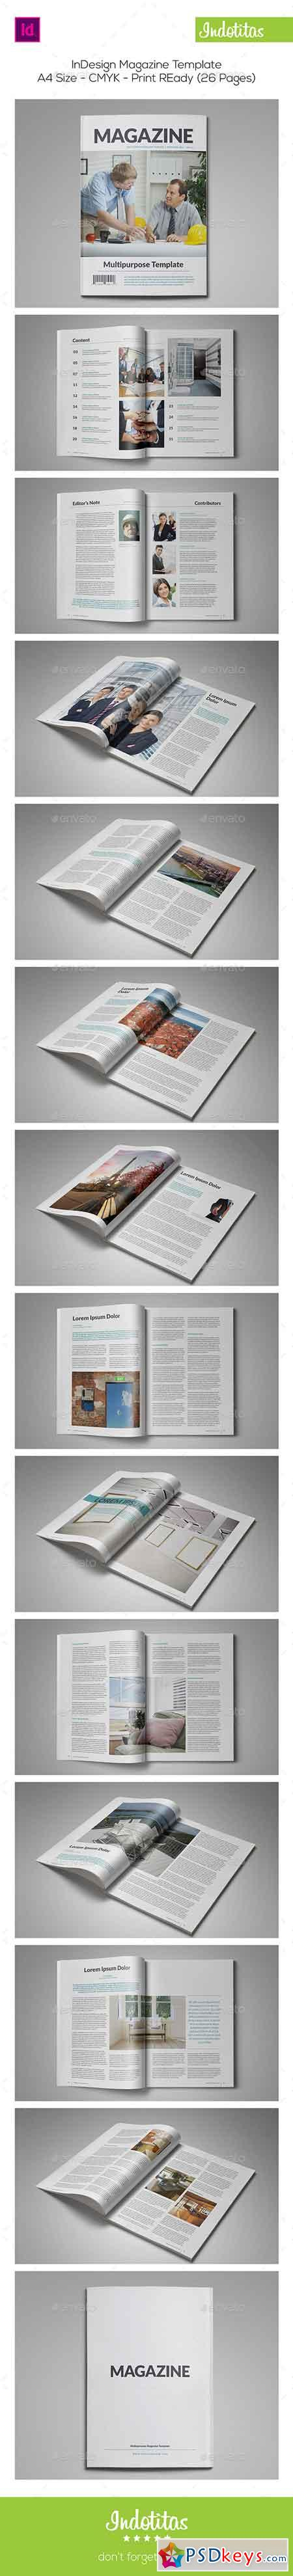 Indesign Magazine Template 8861941